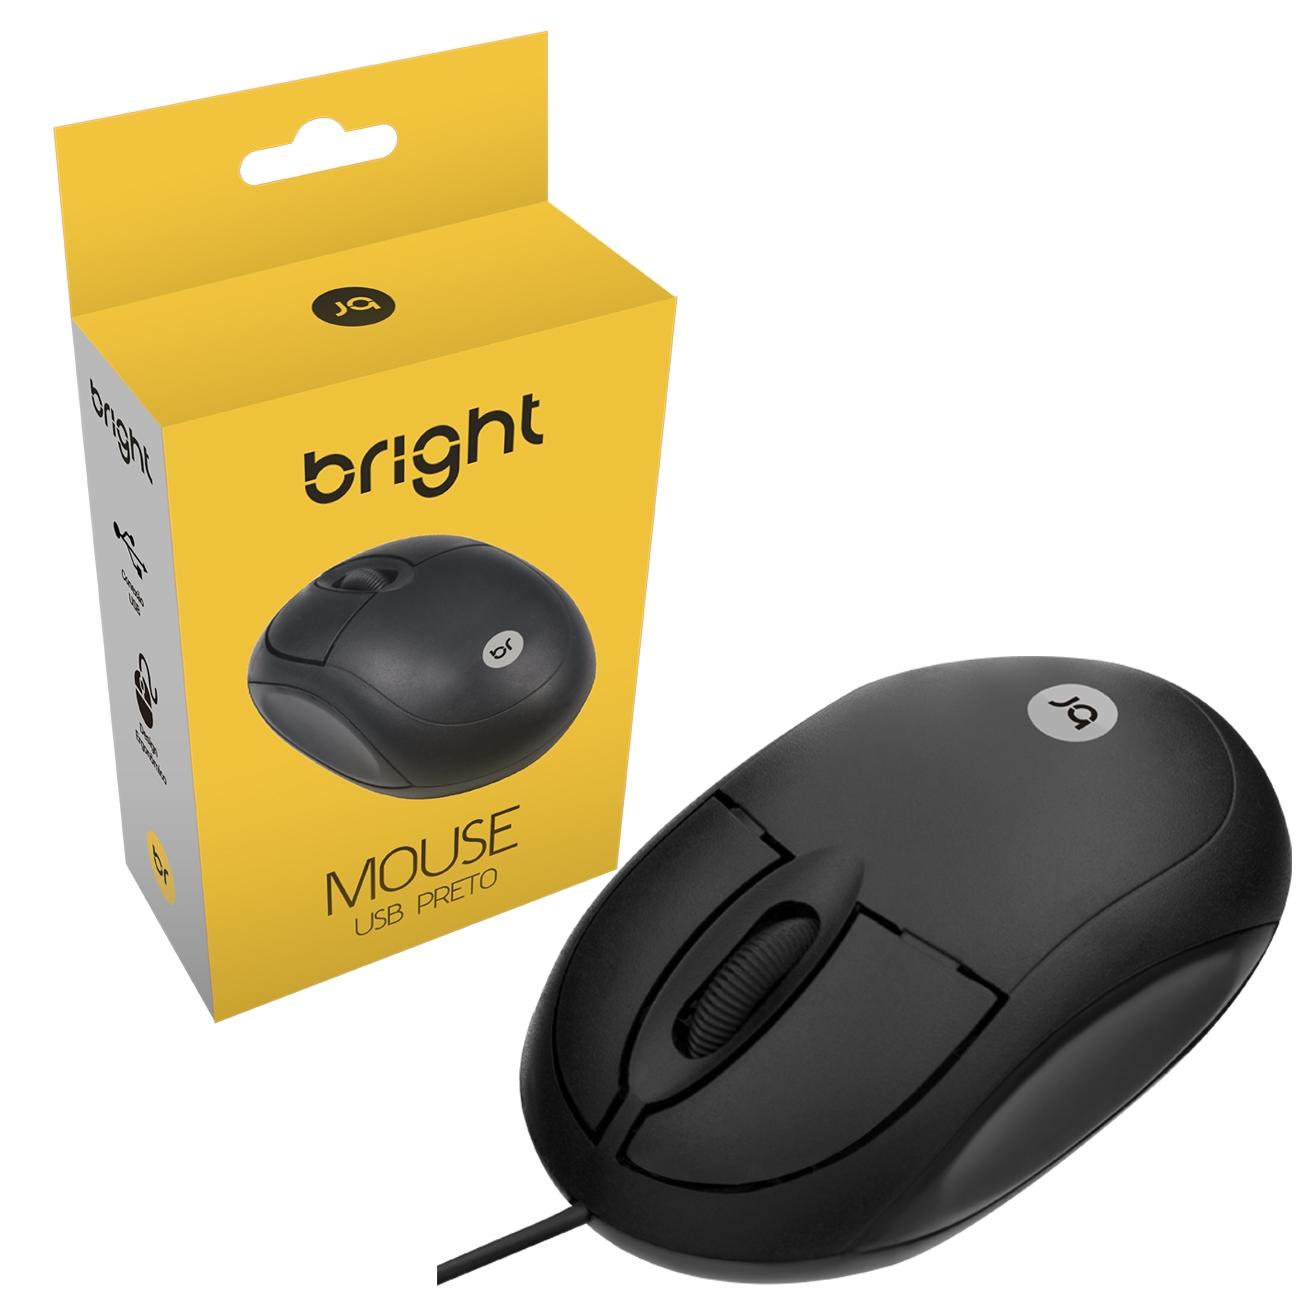 Kit Combo Office Mouse Óptico 800Dpi e Teclado Abnt2 Basic